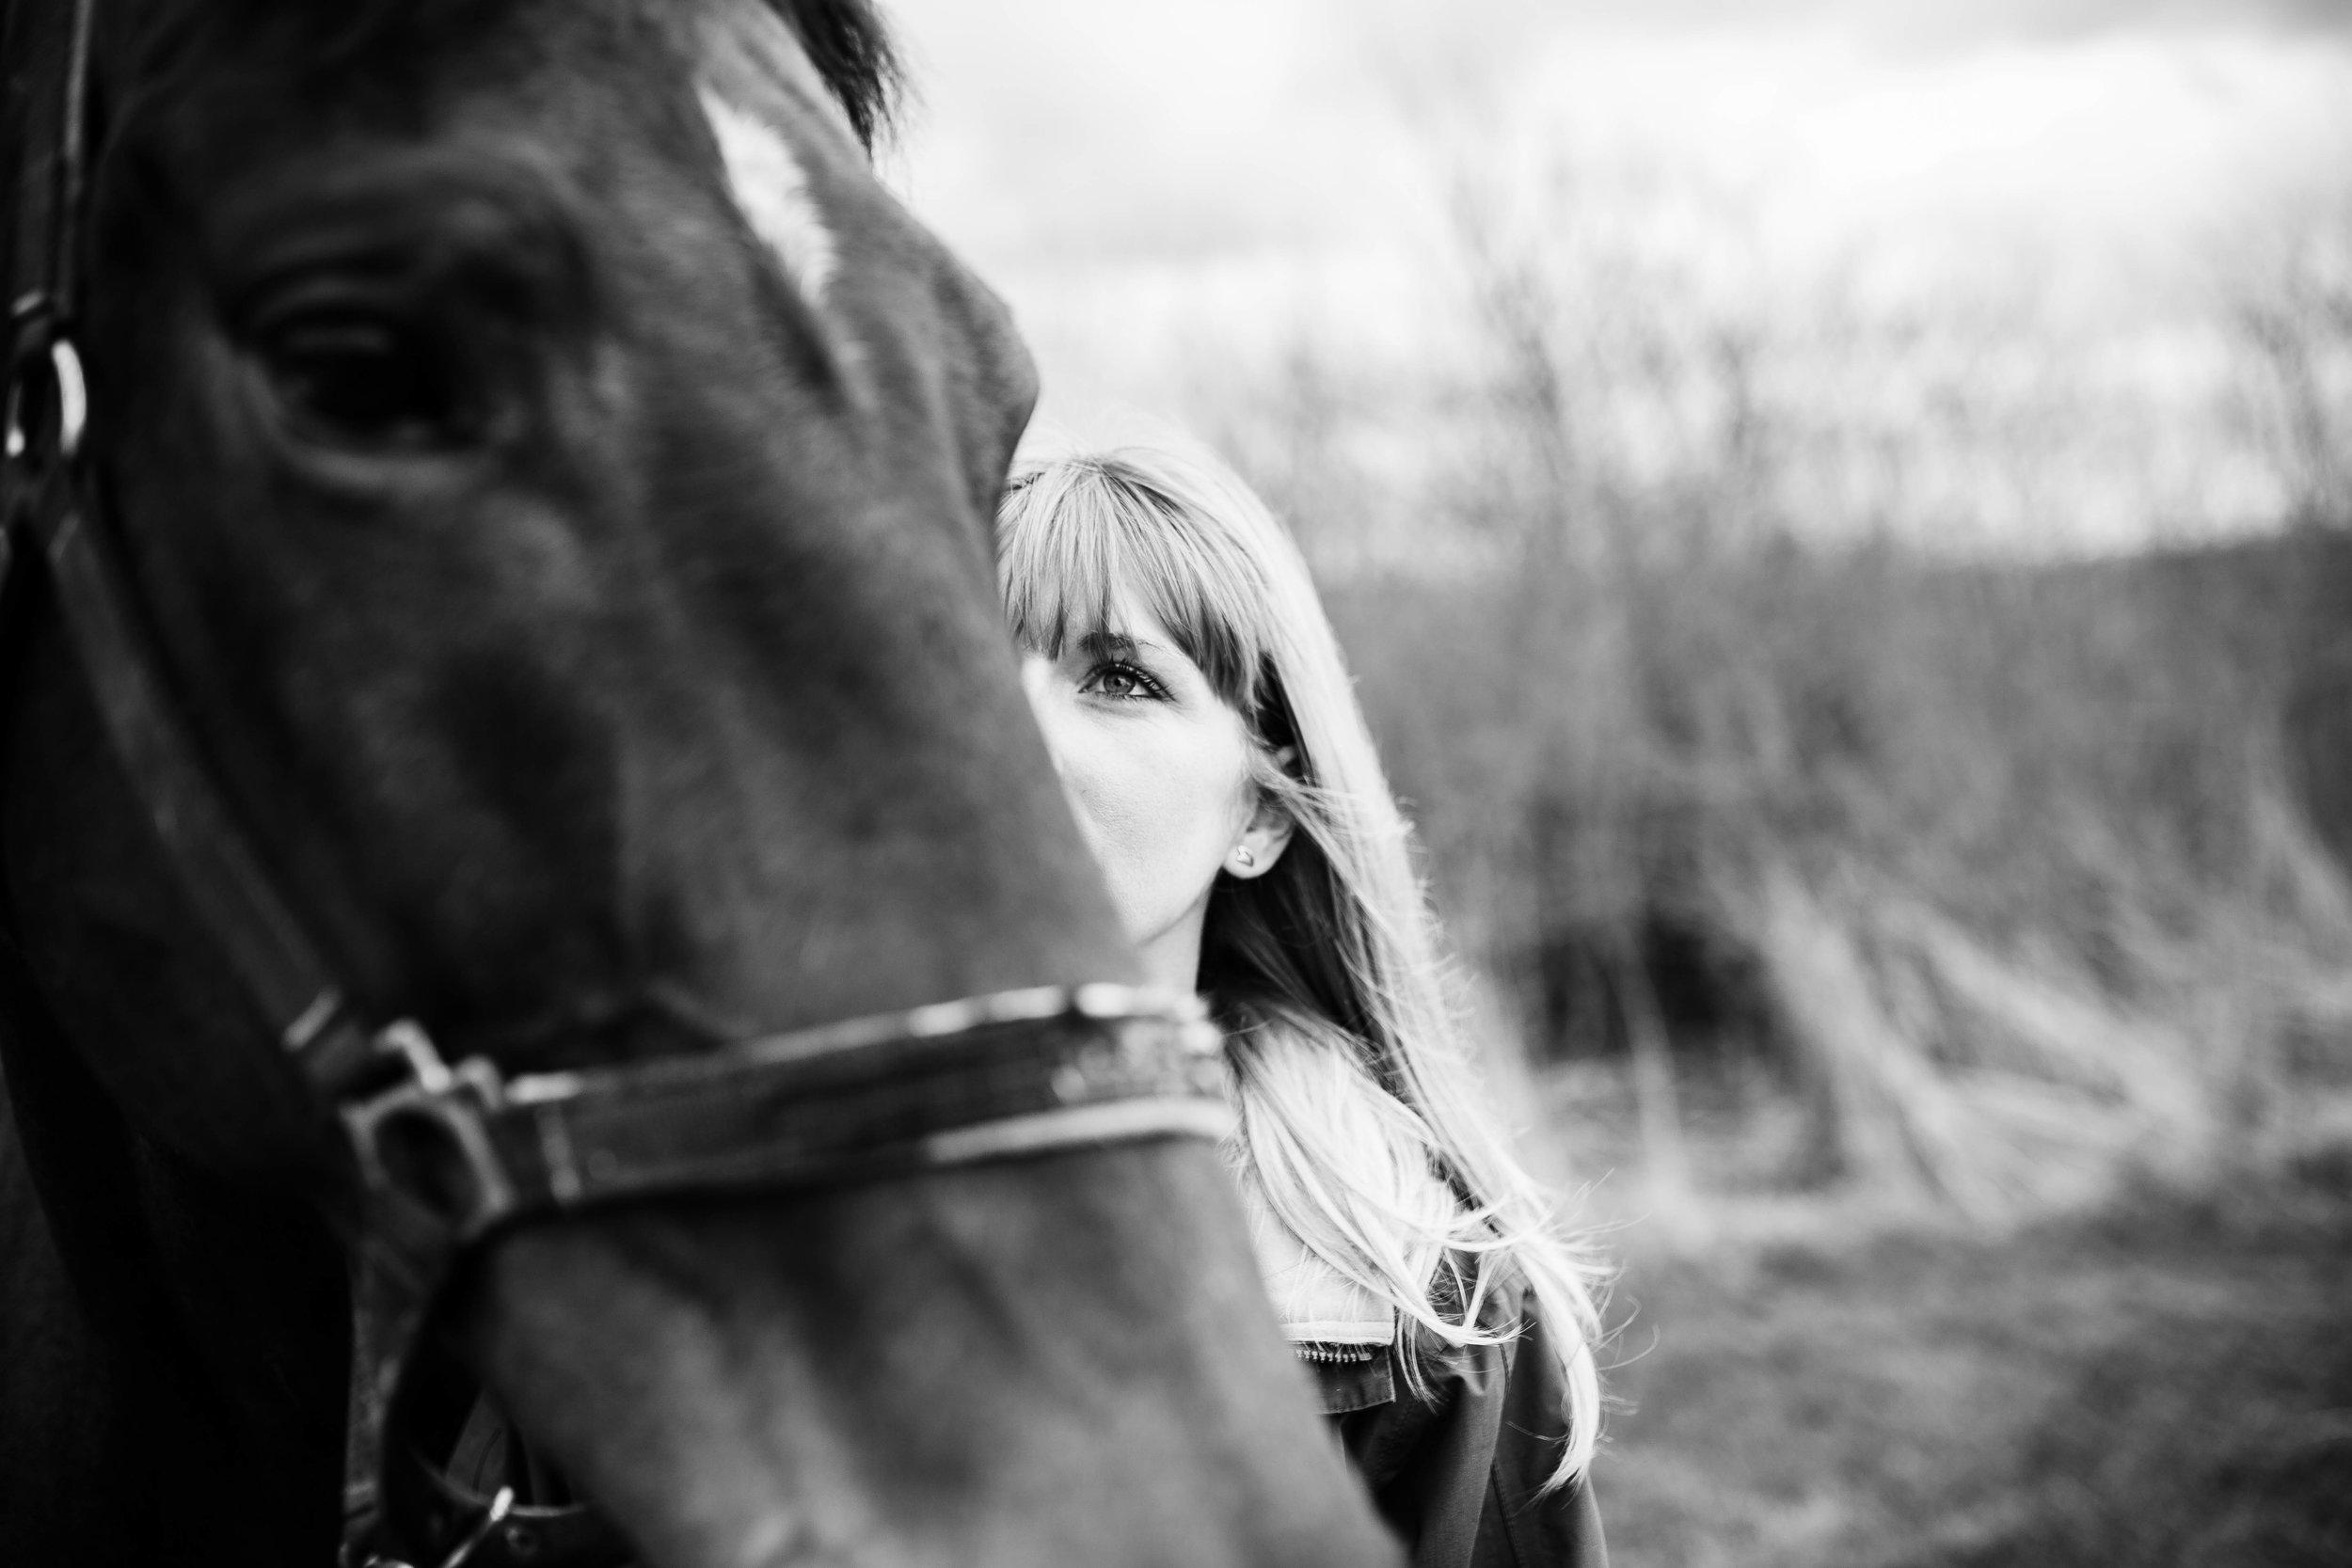 HORSE FARM FAMILY DOG PHOTOSHOOT 00003.JPG